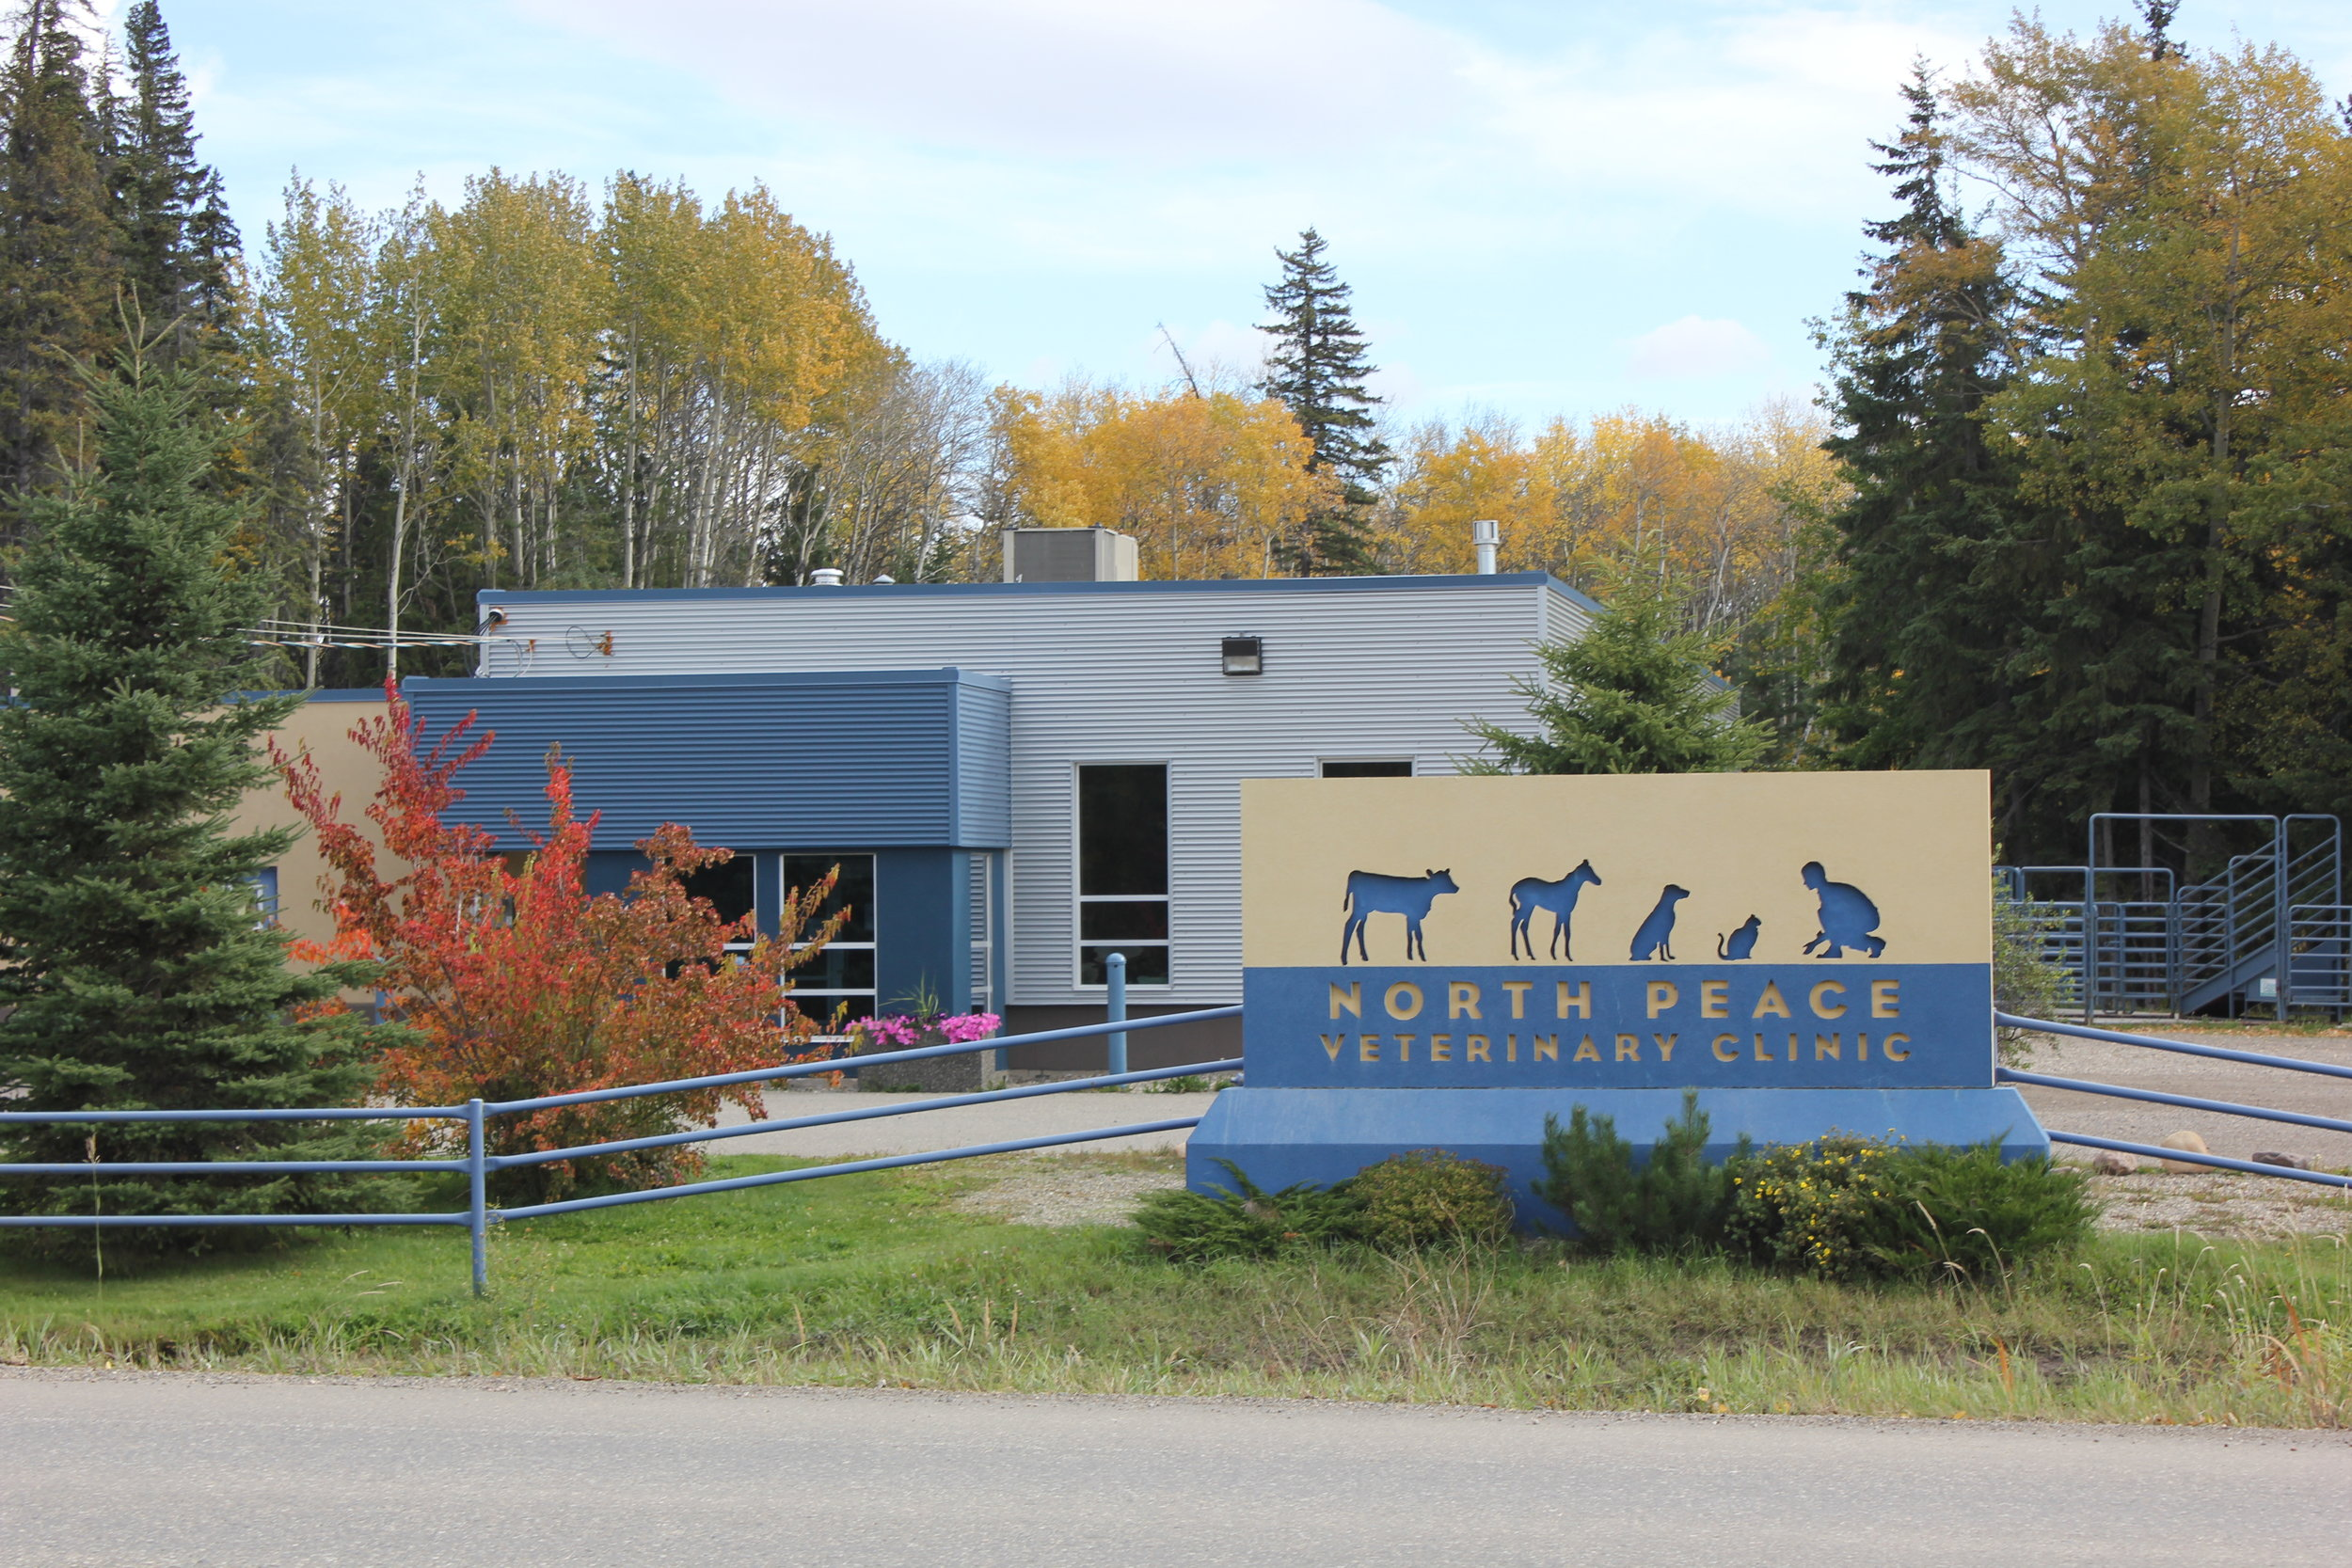 North Peace Veterinary Clinic